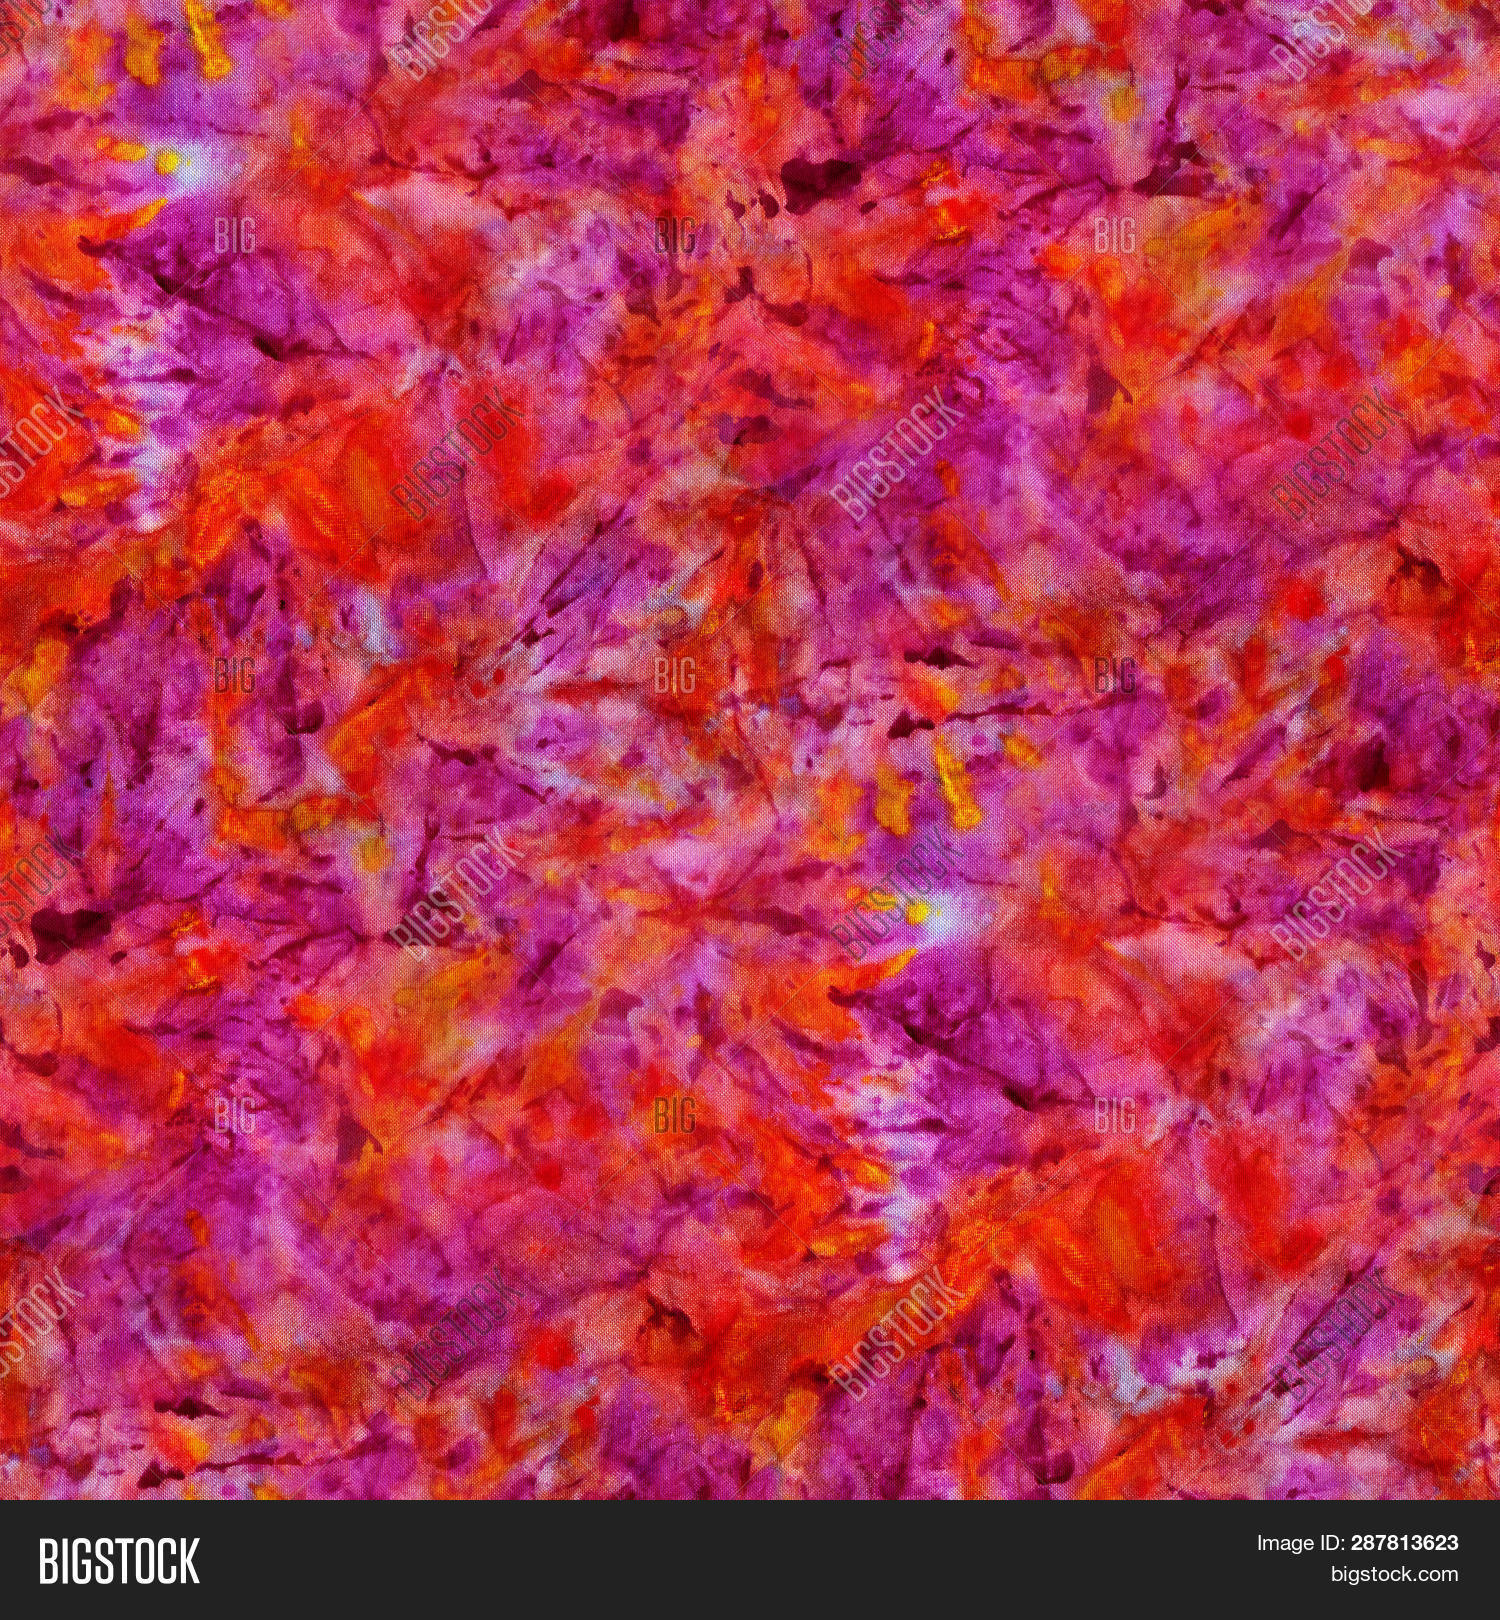 Seamless Tie-dye Image & Photo (Free Trial)   Bigstock